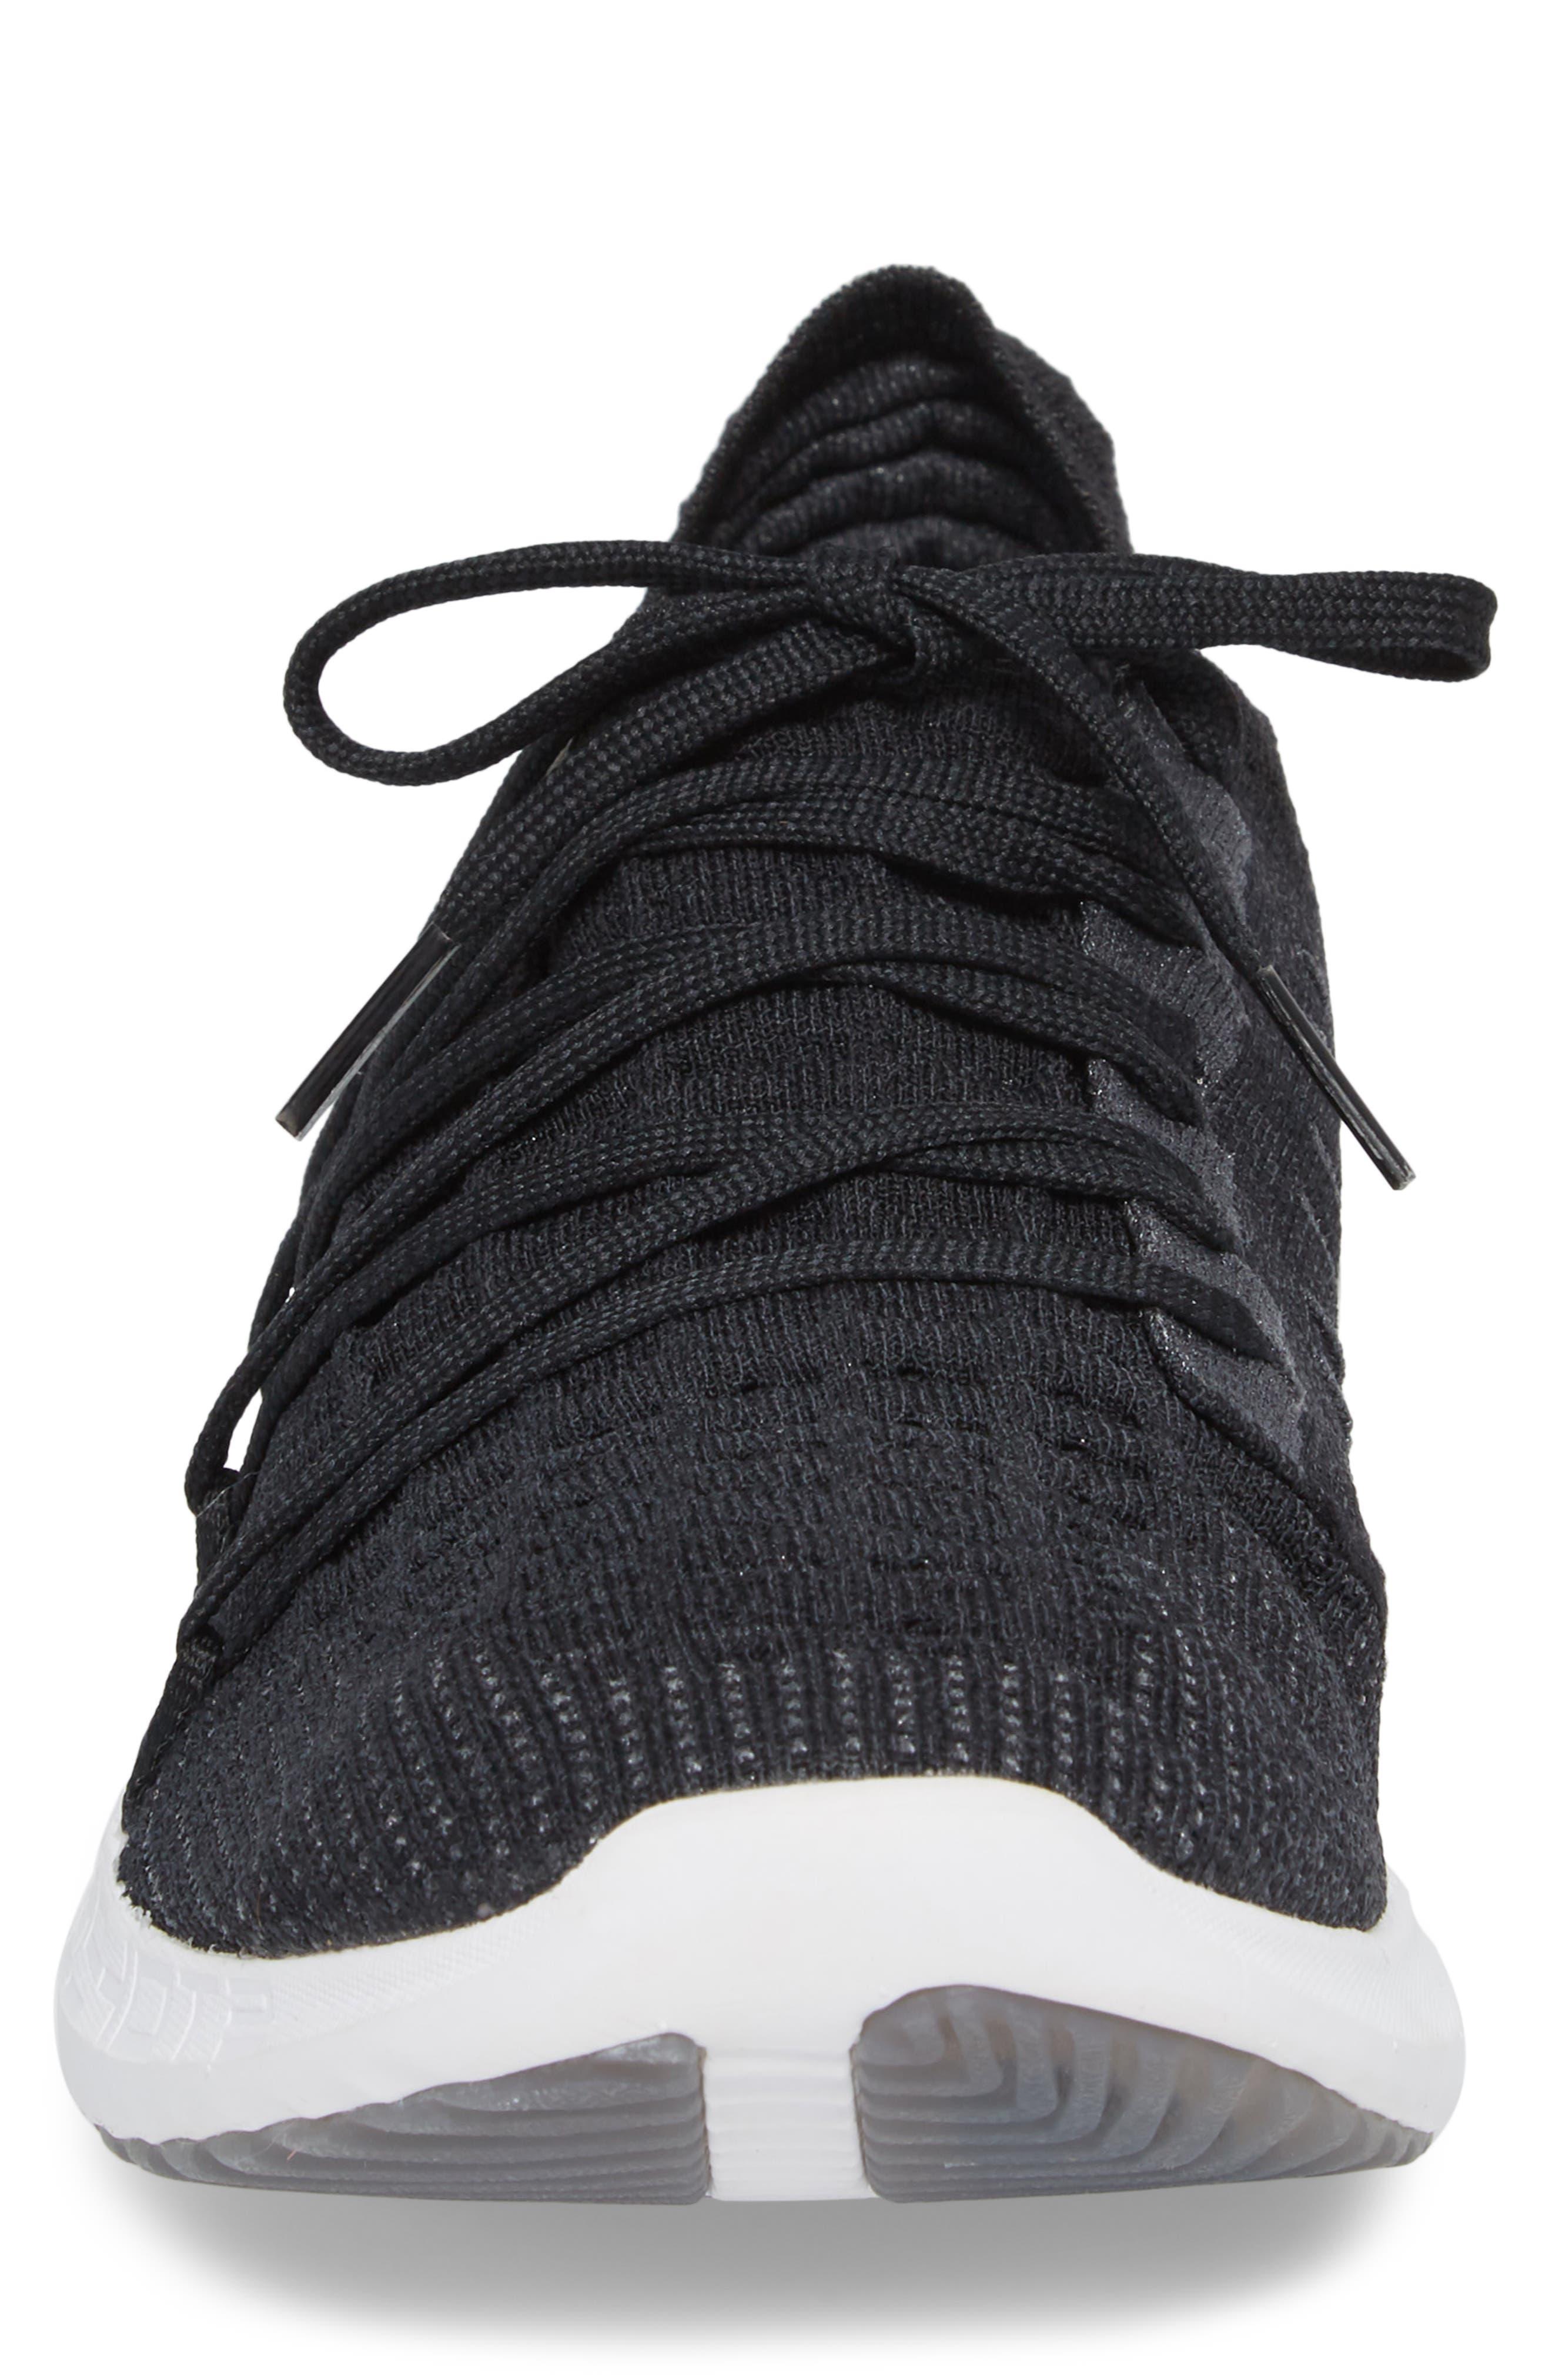 Speedform<sup>®</sup> Slingshot 2 Sneaker,                             Alternate thumbnail 4, color,                             BLACK / ANTHRACITE / METALLIC